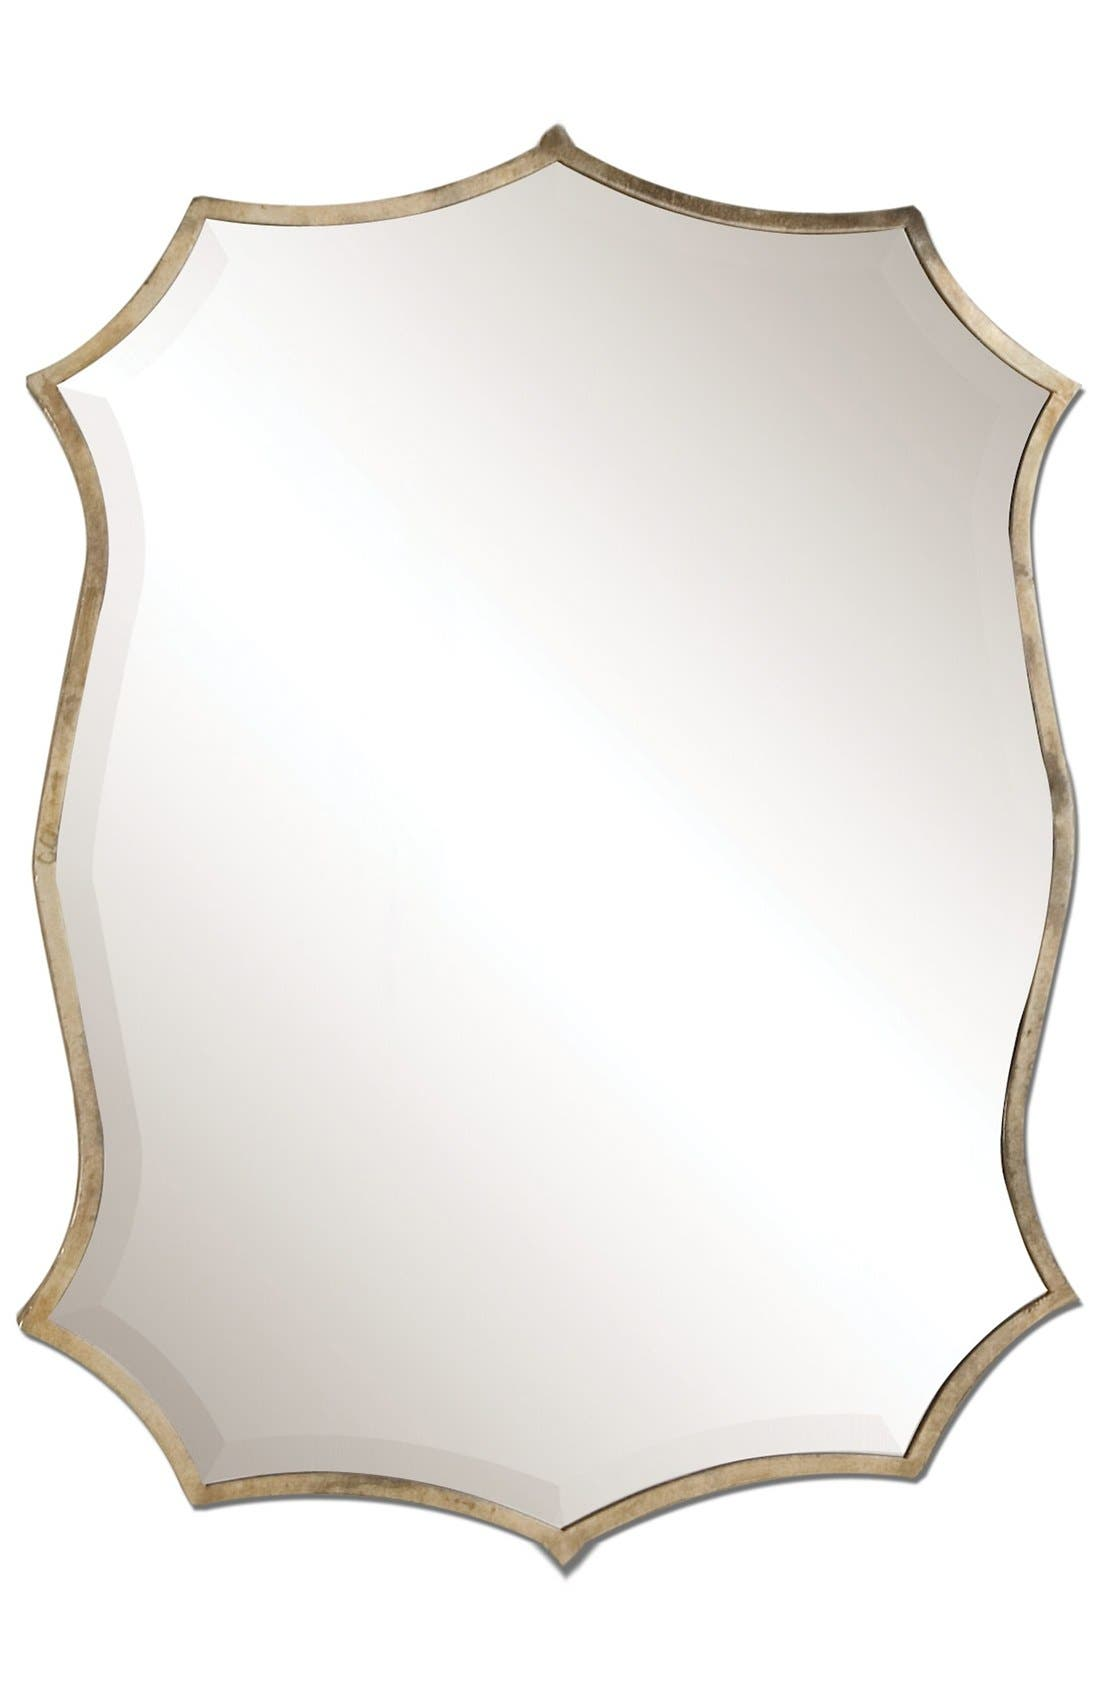 Main Image - Uttermost 'Migiana' Oxidized Nickel Wall Mirror